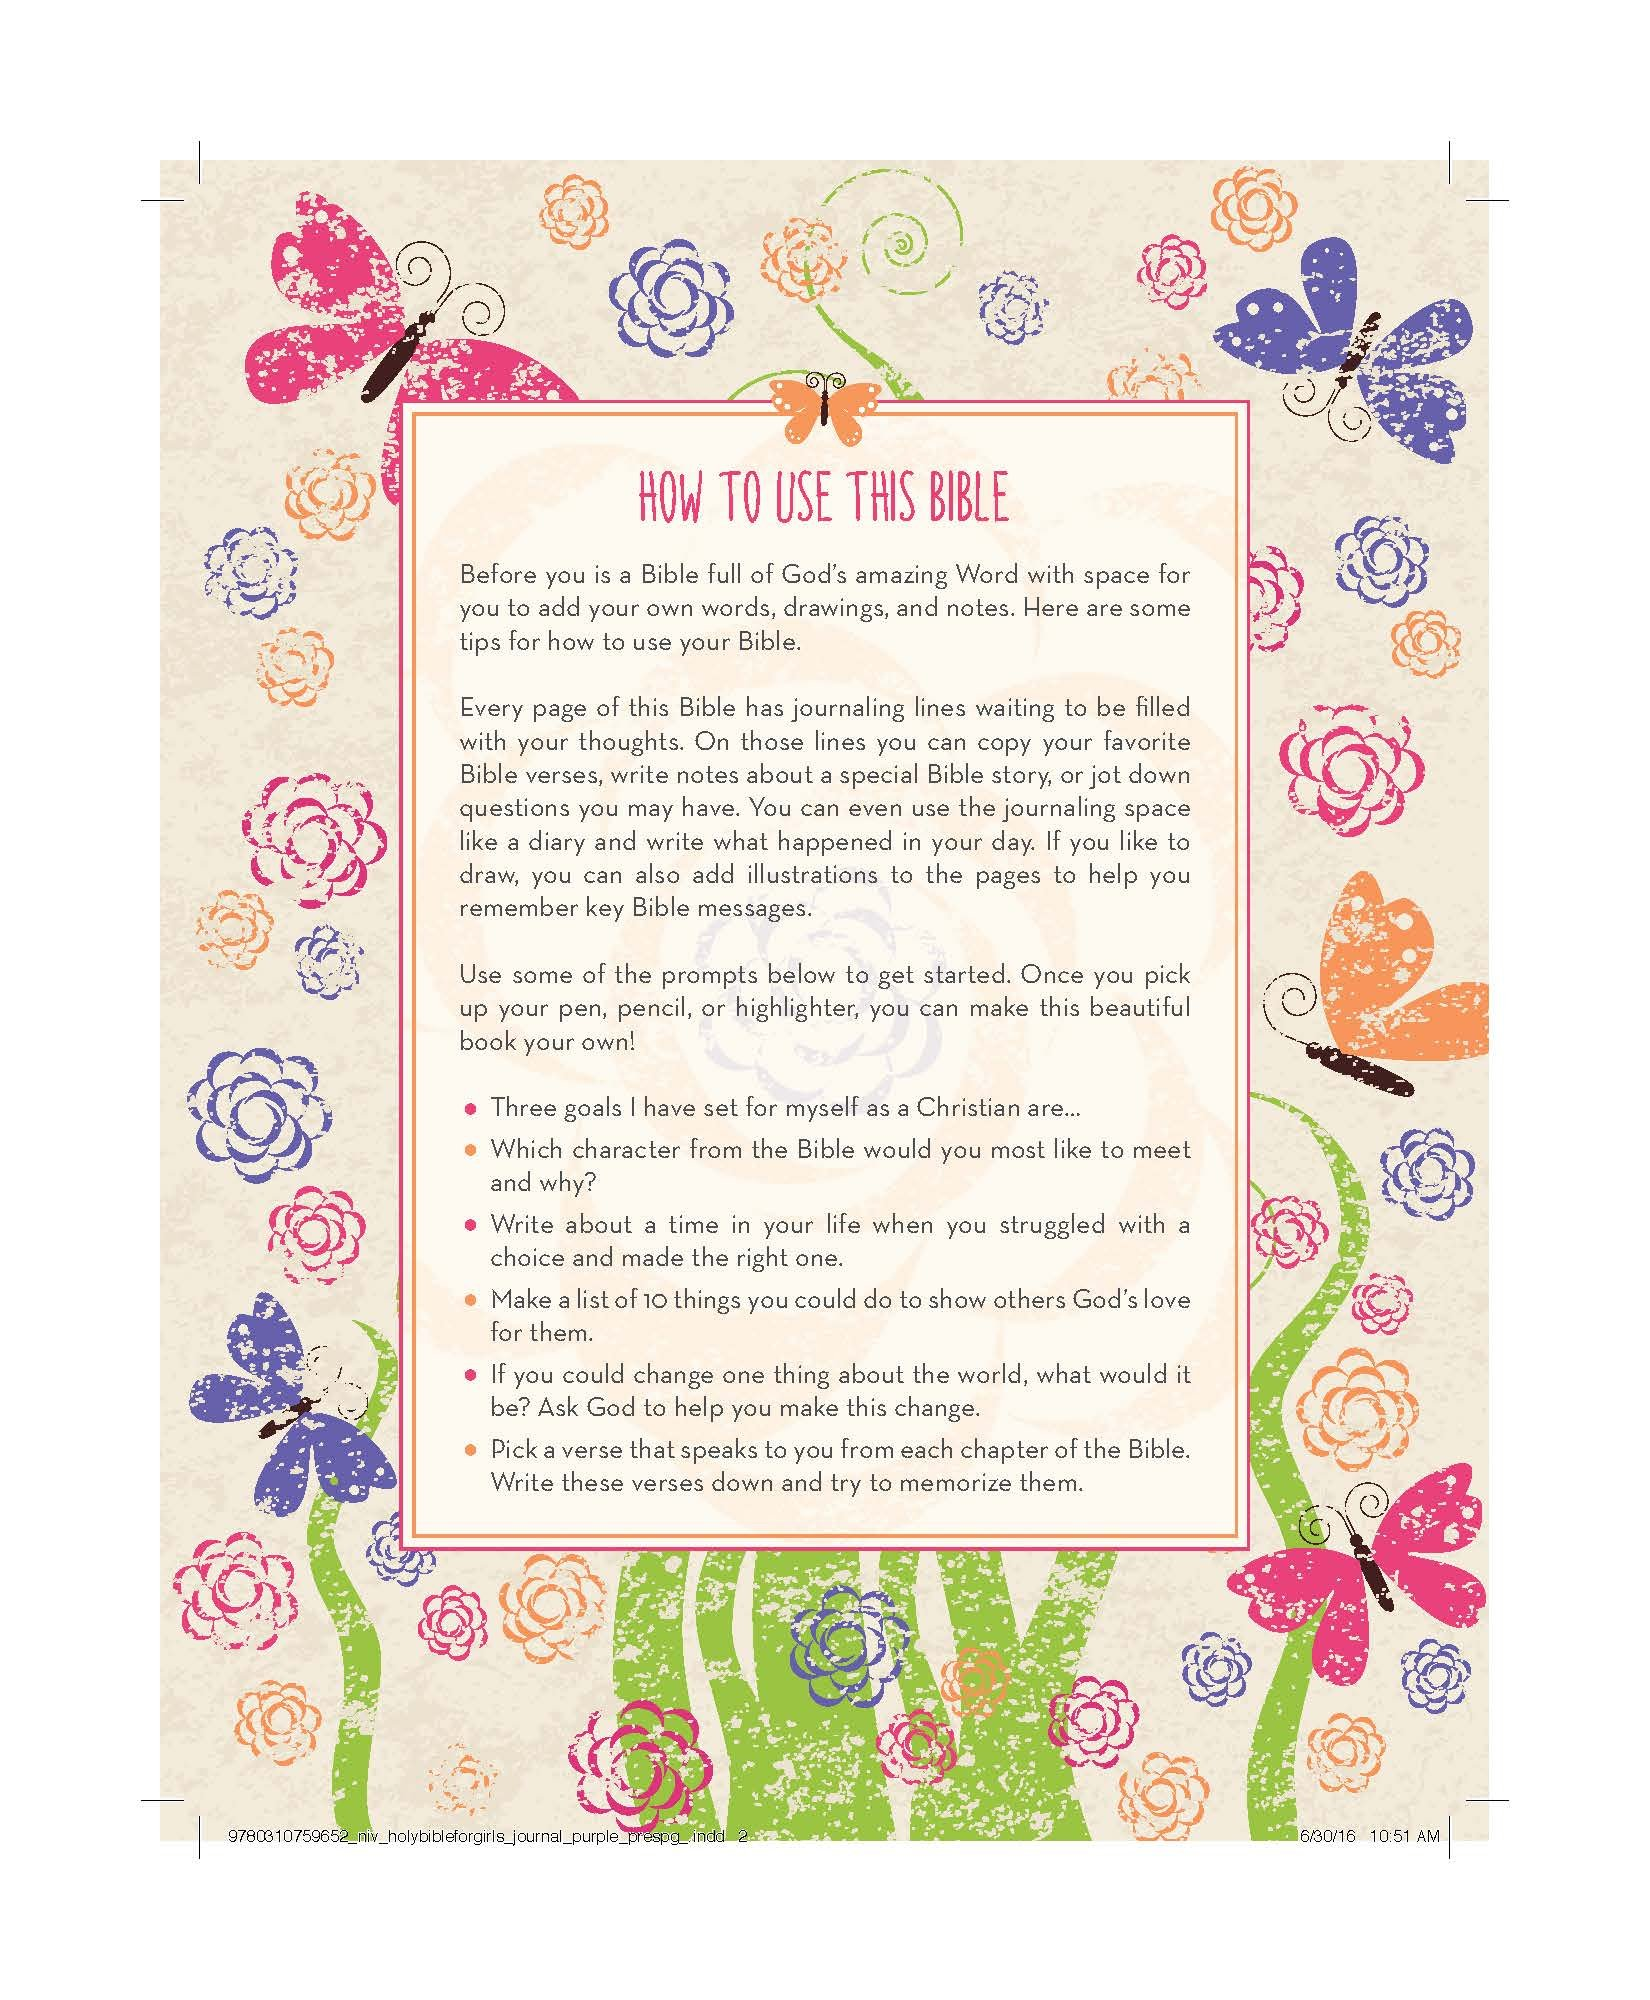 NIV, Holy Bible for Girls, Journal Edition, Hardcover, Purple, Elastic Closure